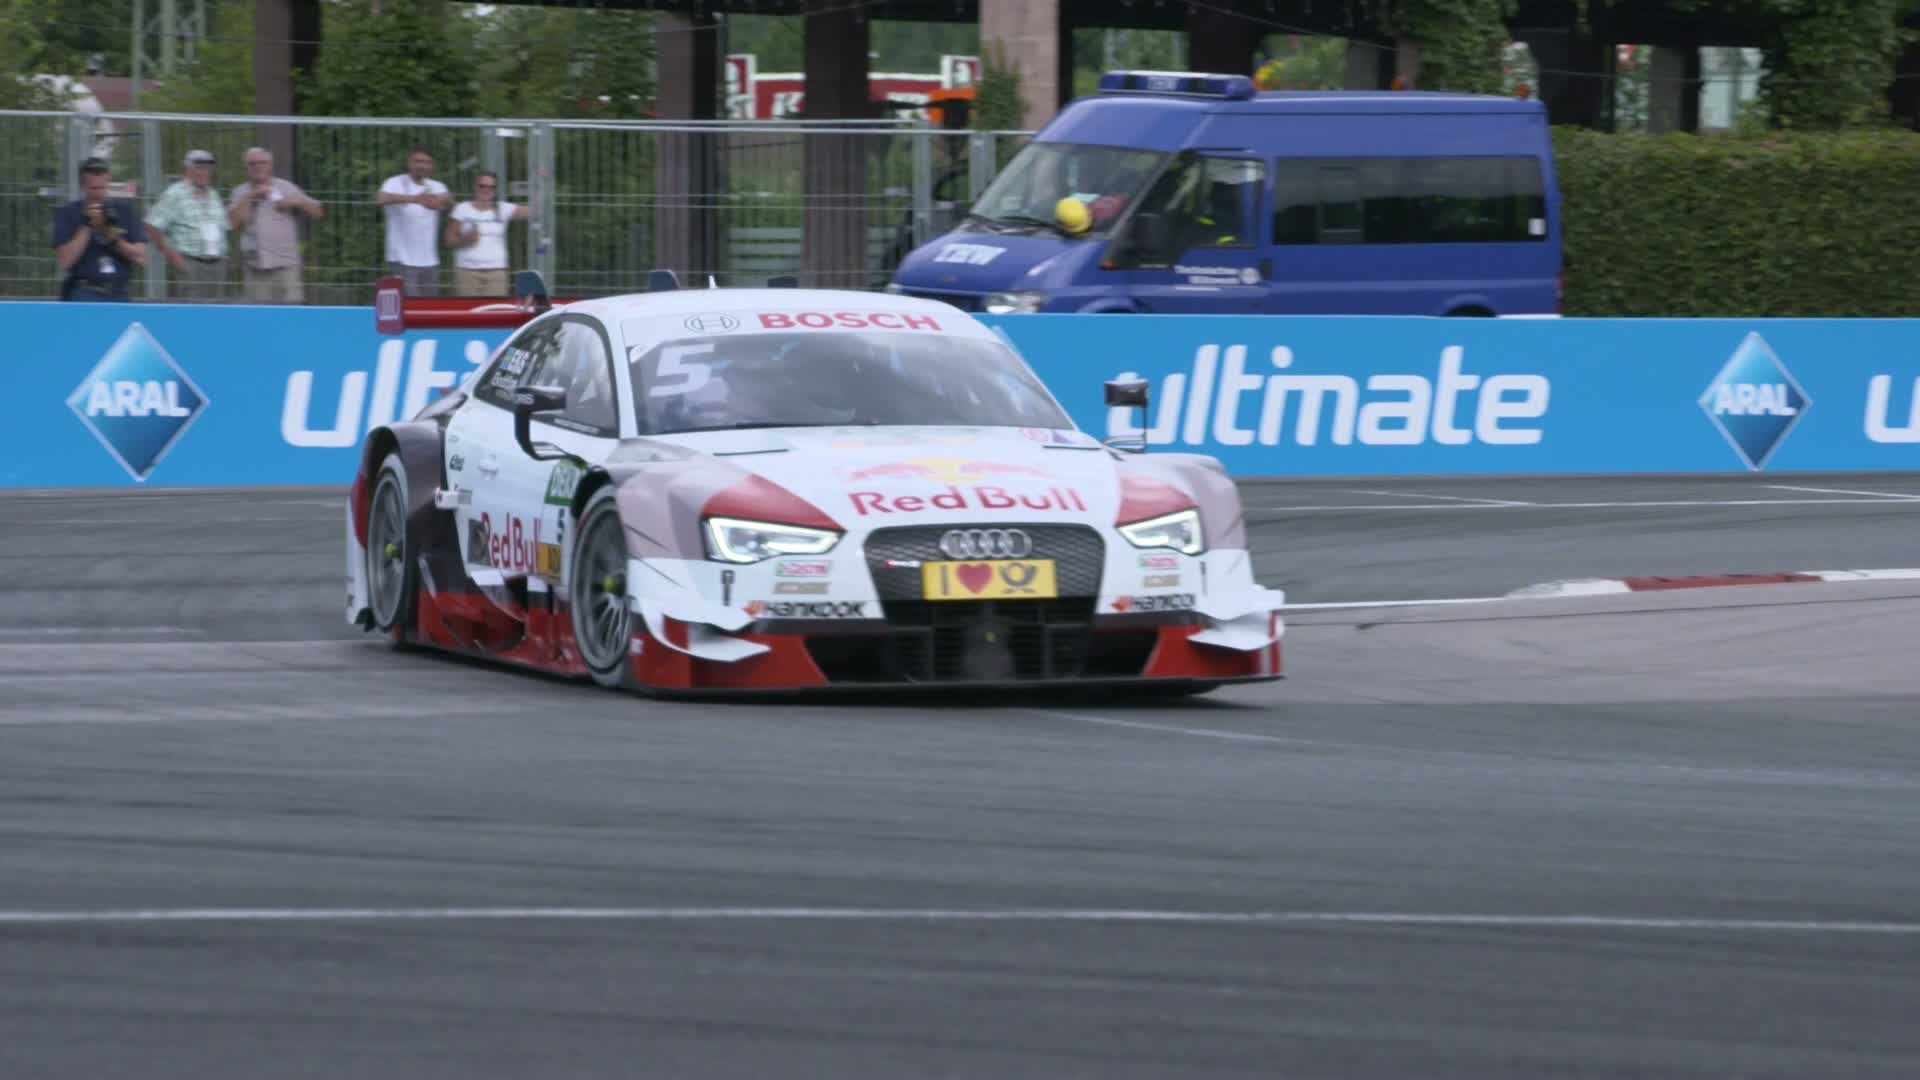 60 Seconds of Audi Sport 45/2015 - DTM Norisring, 25 Jahre später